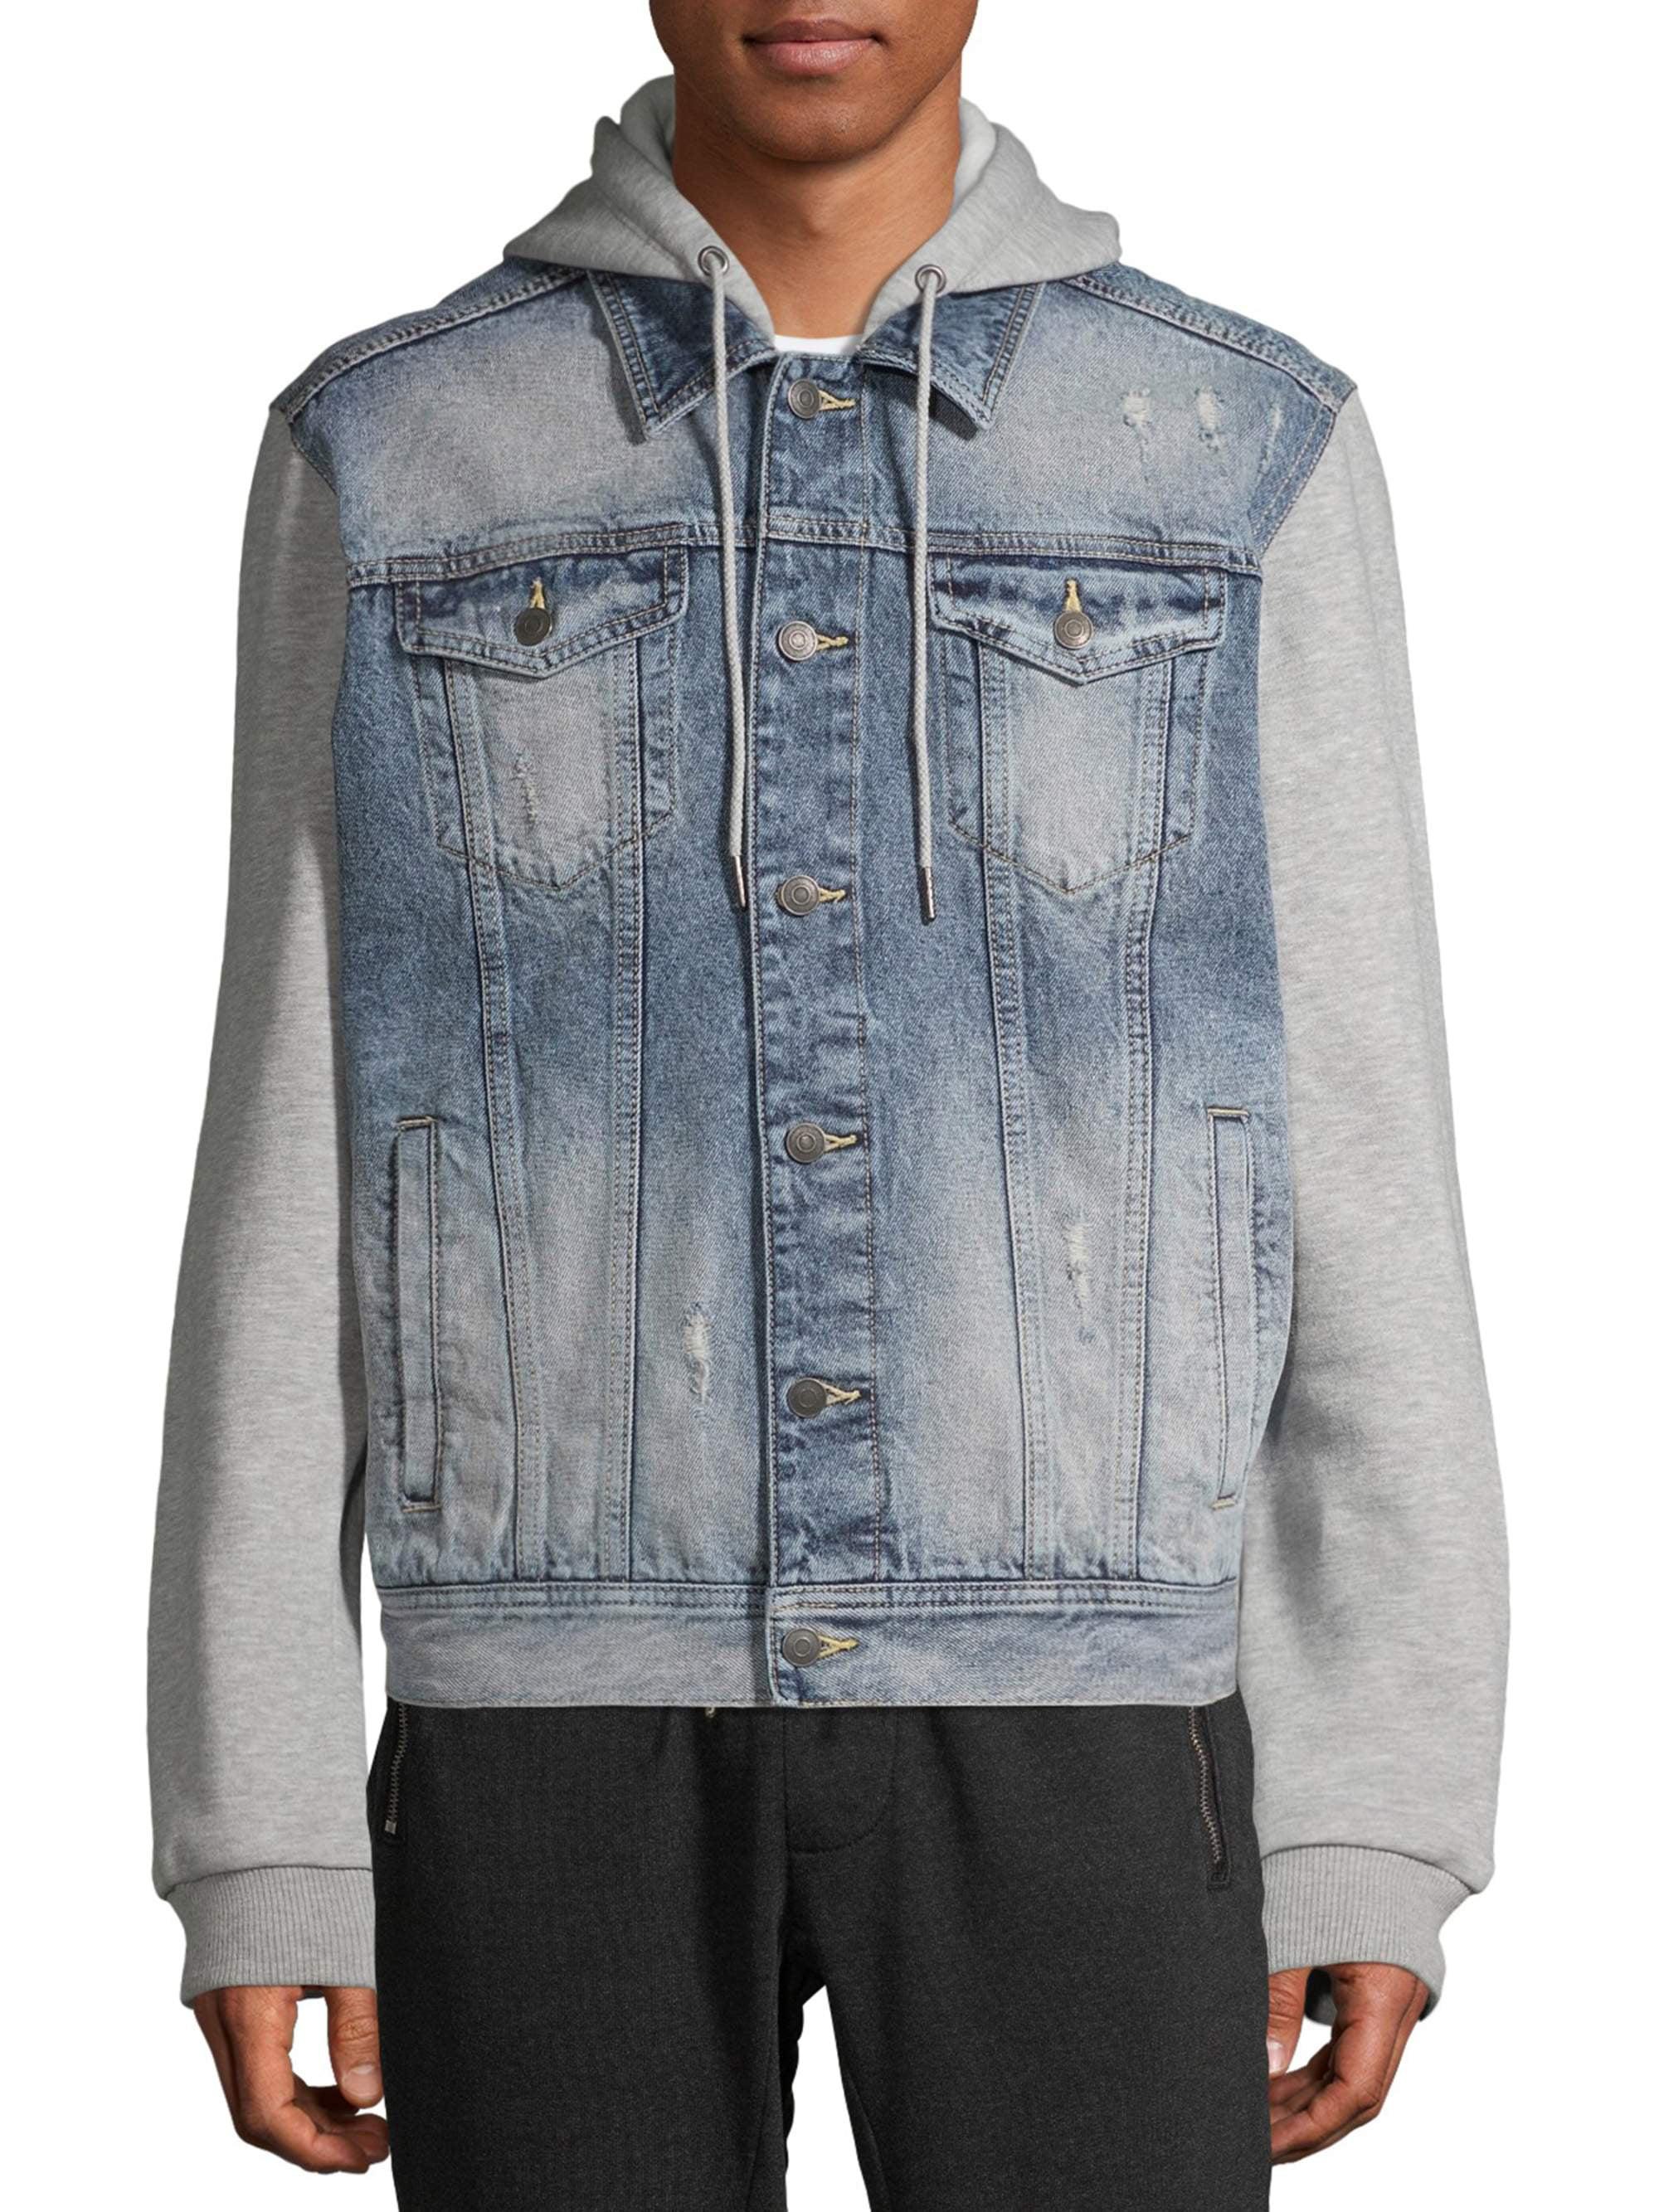 Hooded Patched Oversized Combo Denim Jacket